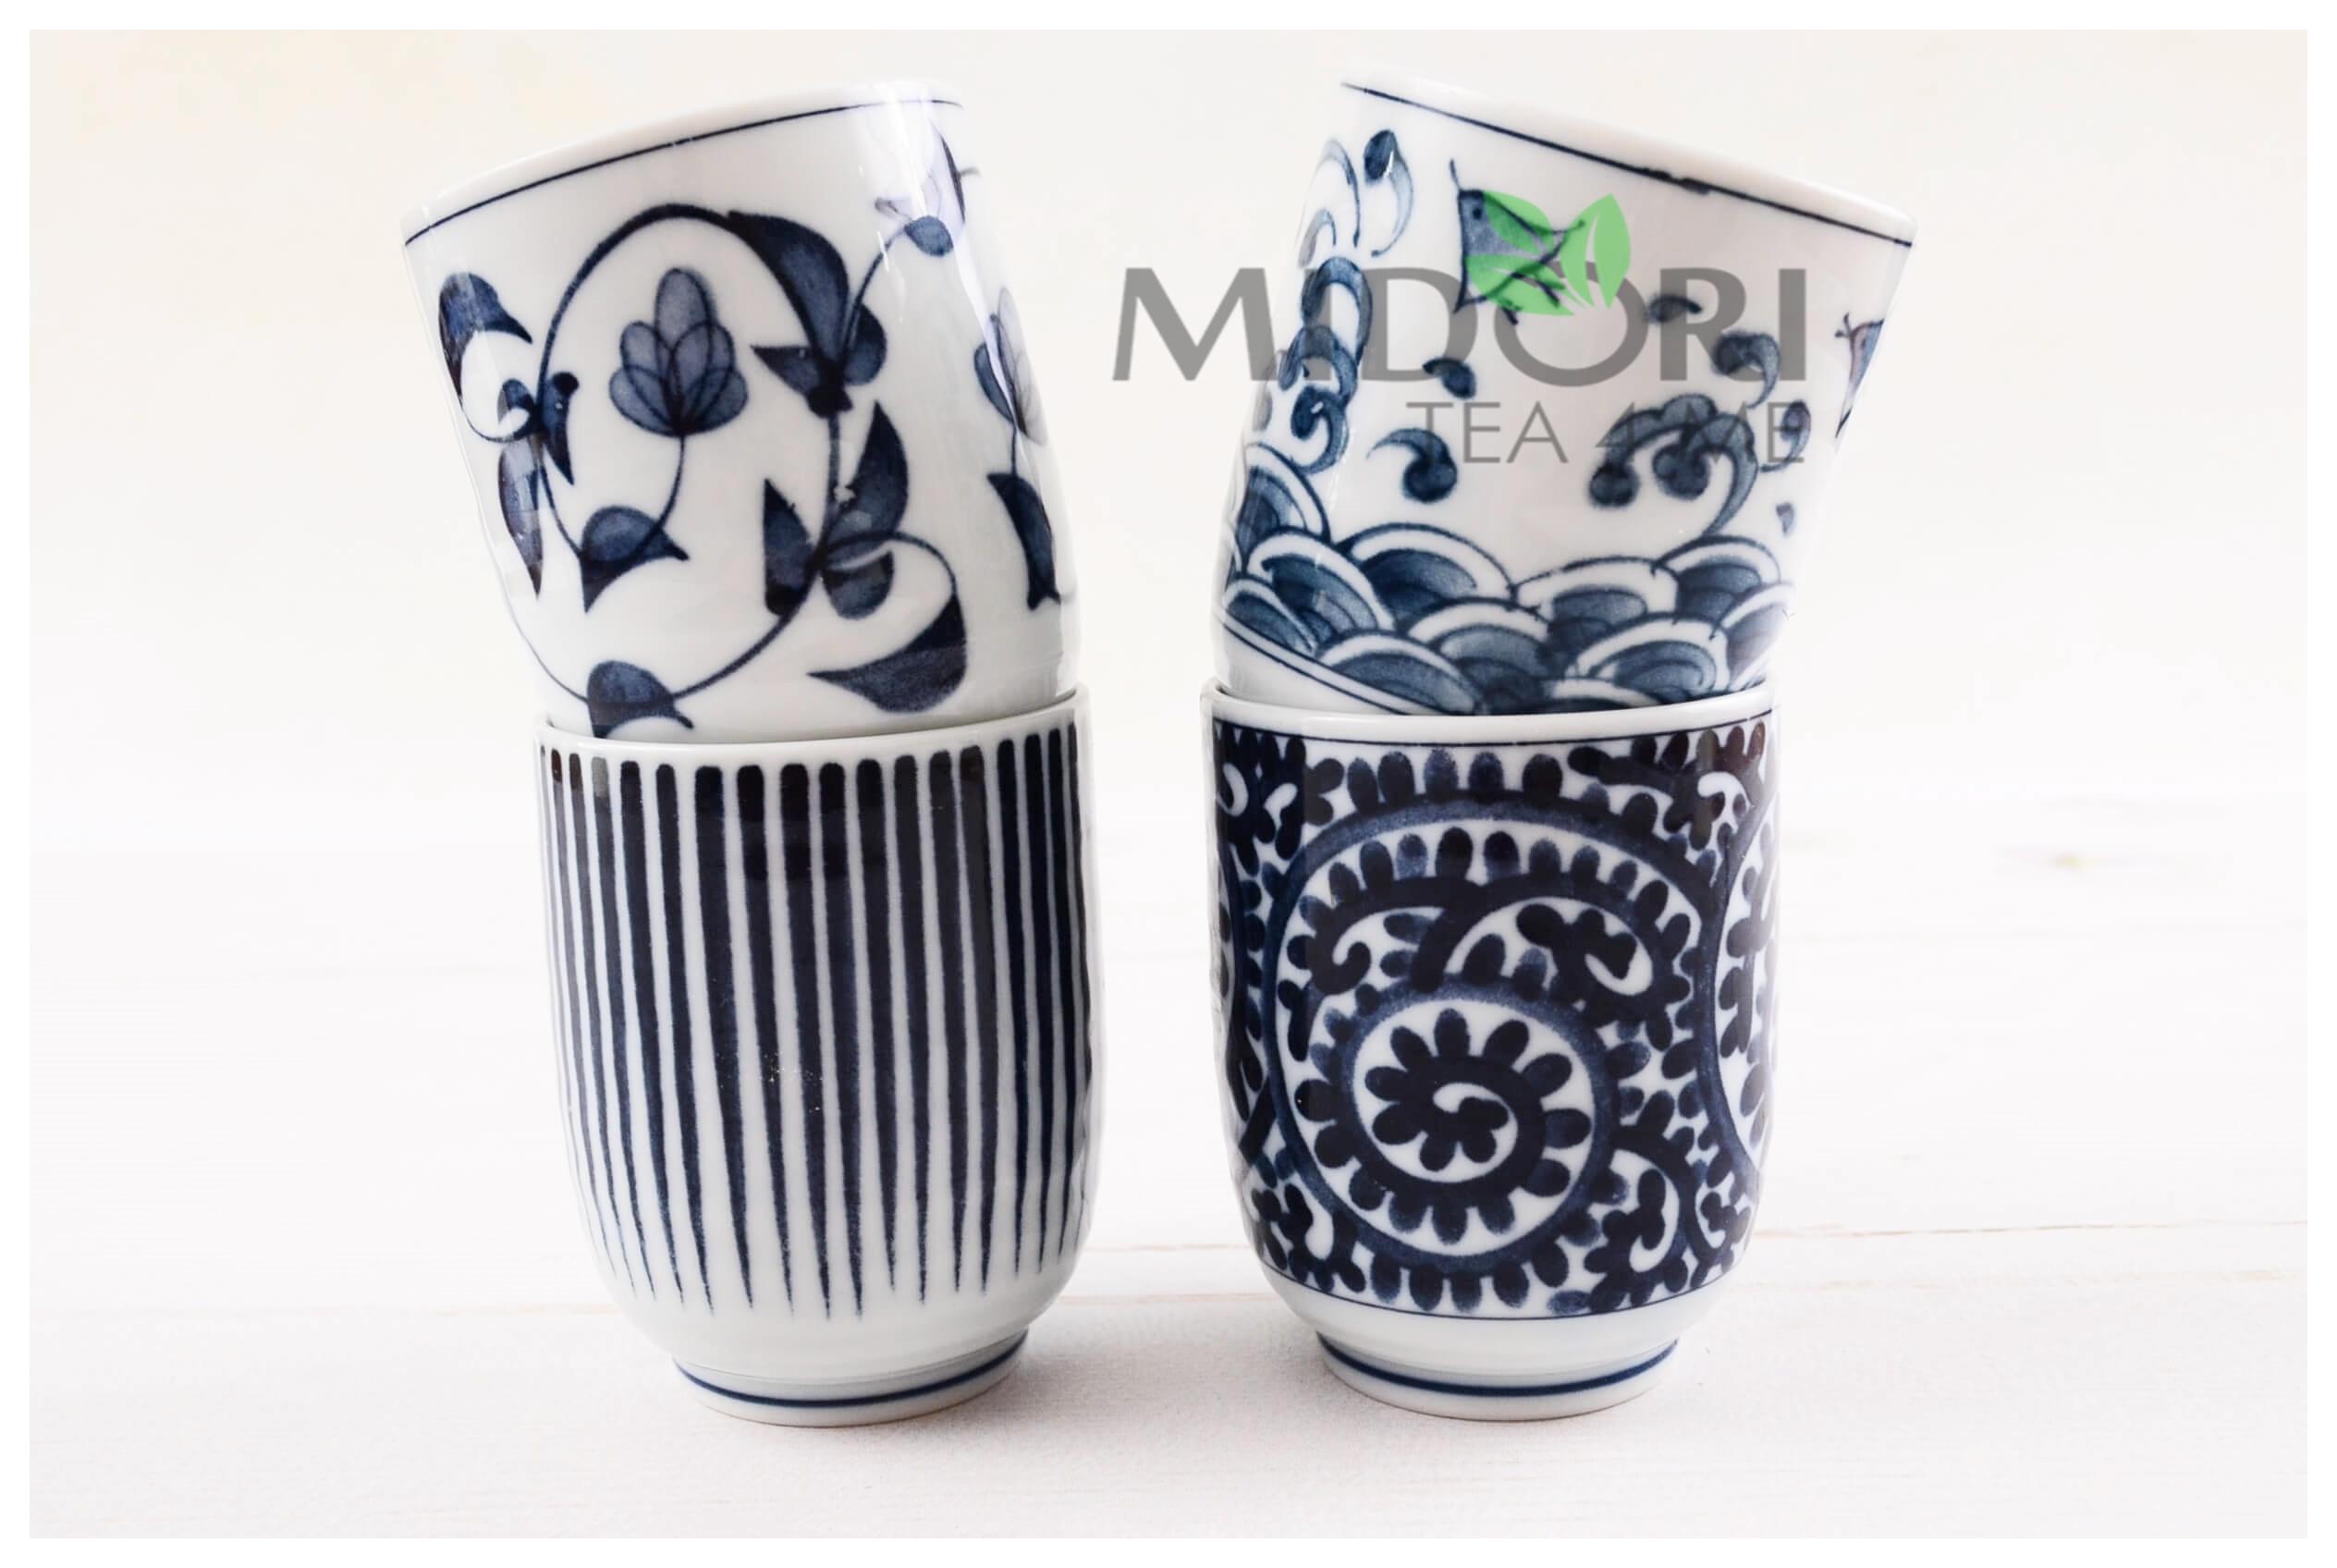 czarki ceramiczne, czarki ceramiczne tokyo design